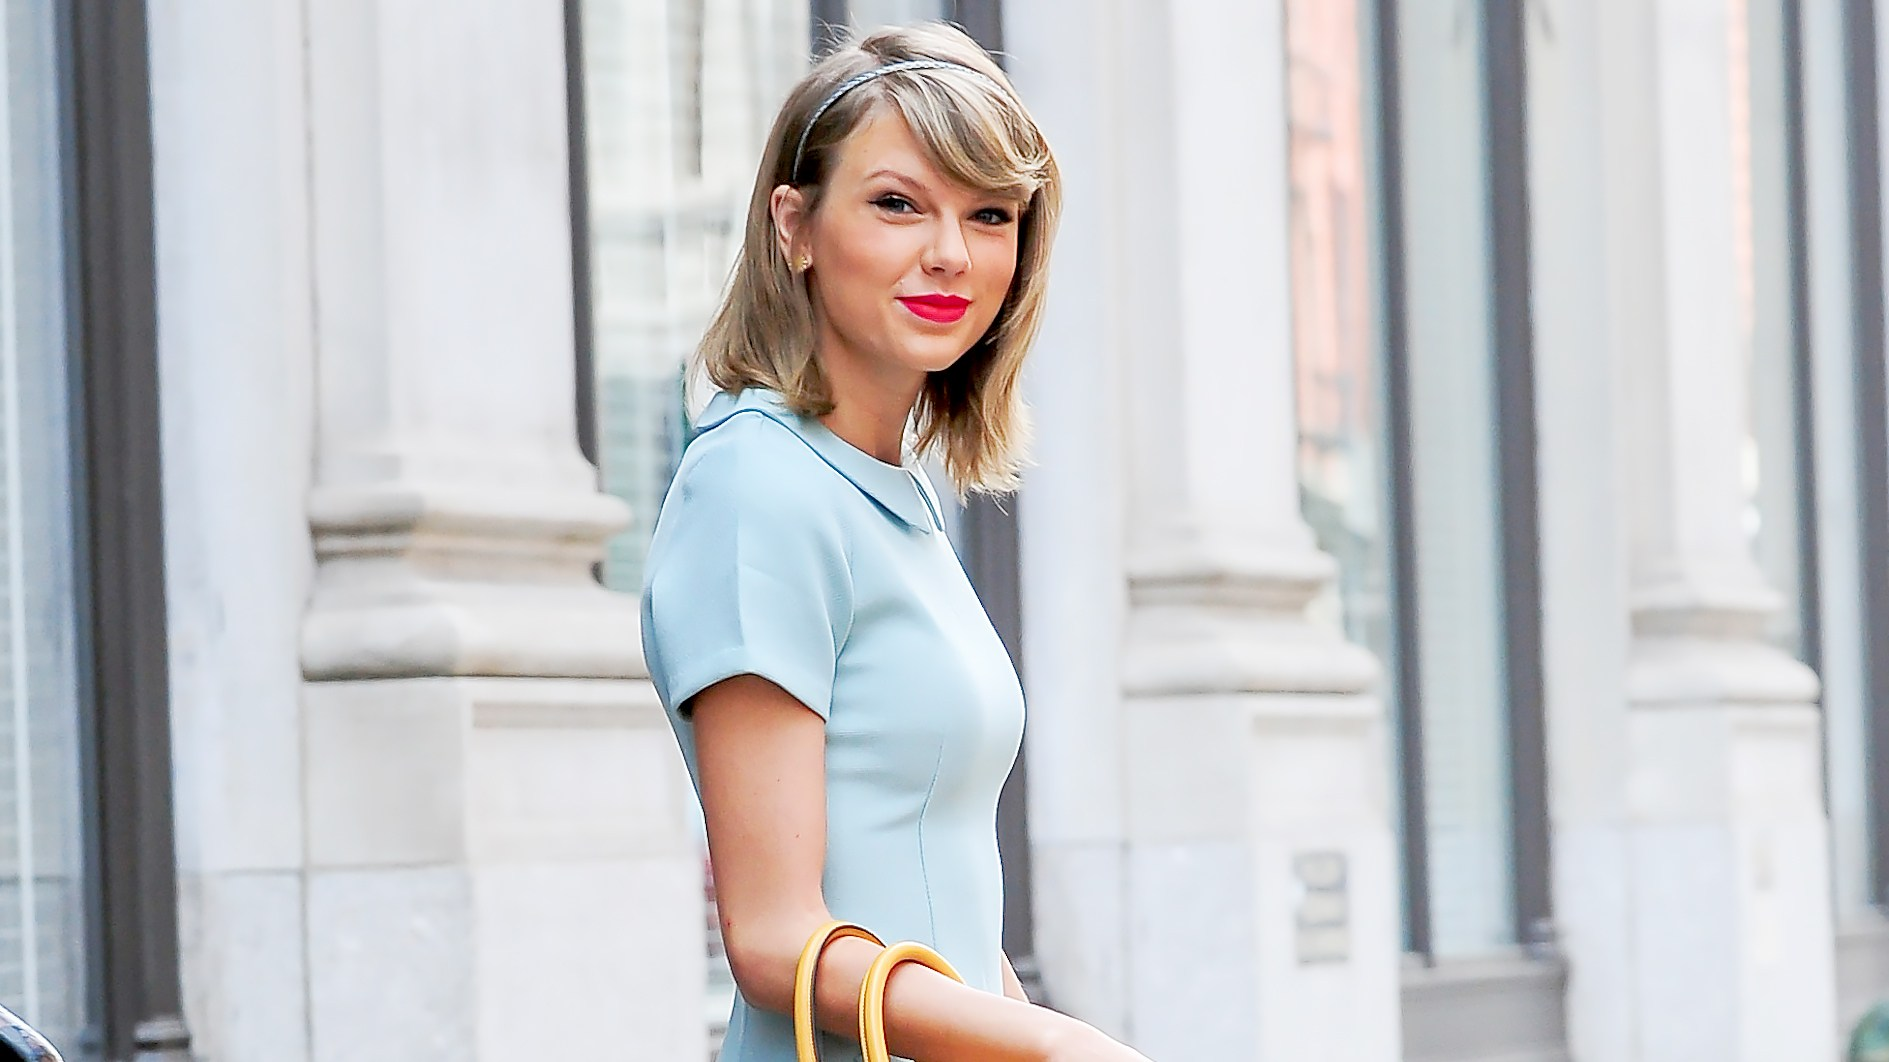 Taylor Swift is seen walking in Soho on April 19, 2015 in New York City.